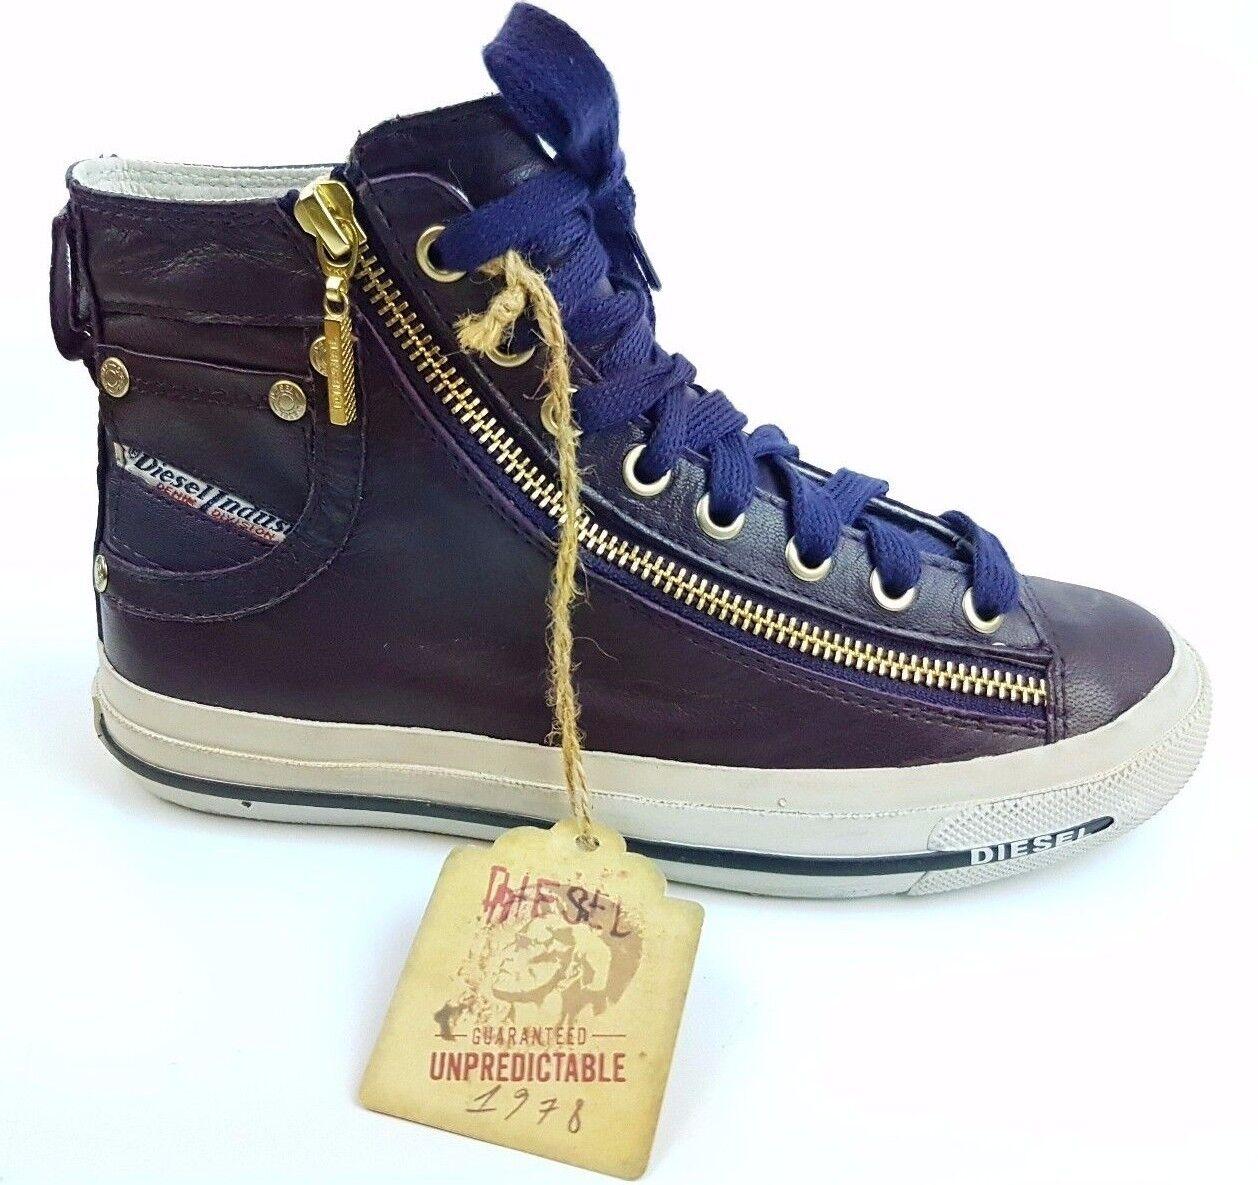 DIESEL Sneaker EXPO-ZIP Schuhes Damen Schuhe Sneakers Damens Schuhes EXPO-ZIP Lila Violett Y01067 MO 32caf3